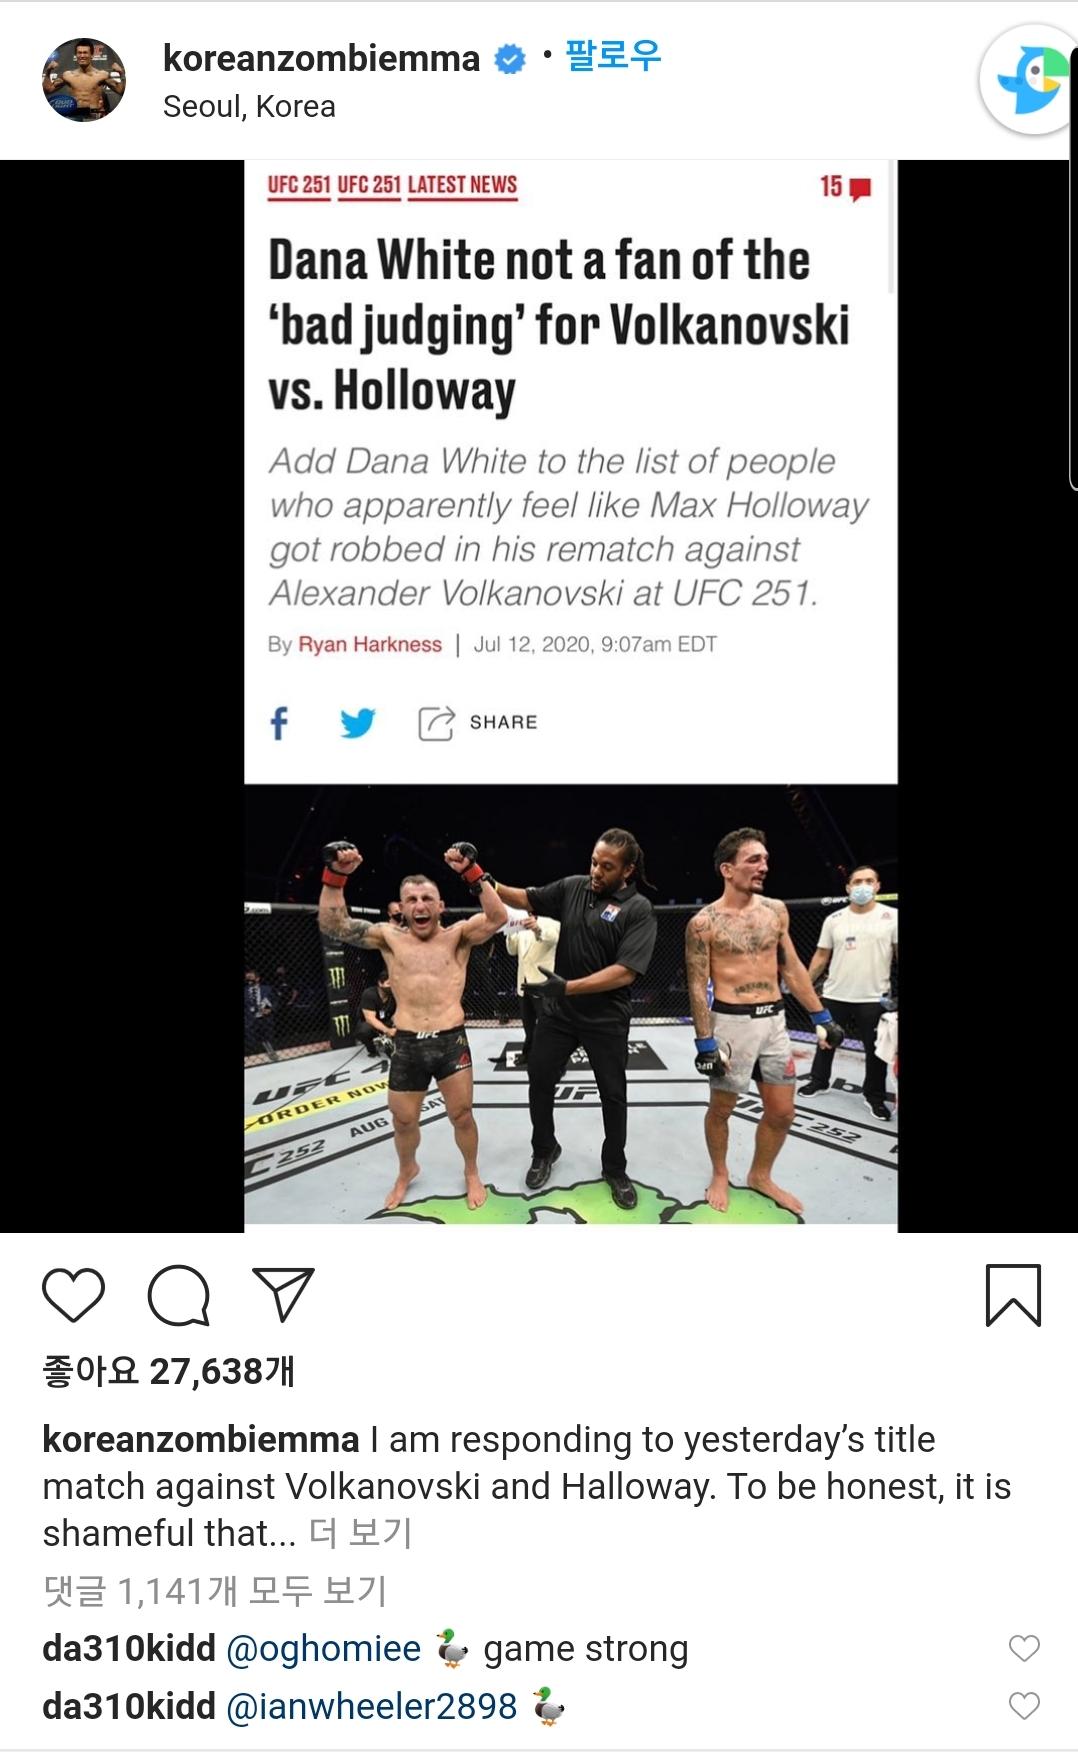 [UFC 트윗 단신] 정찬성 : 알렉산더 볼카노프스키는 부끄러운 챔피언  요안나 옌드레이칙 은퇴?